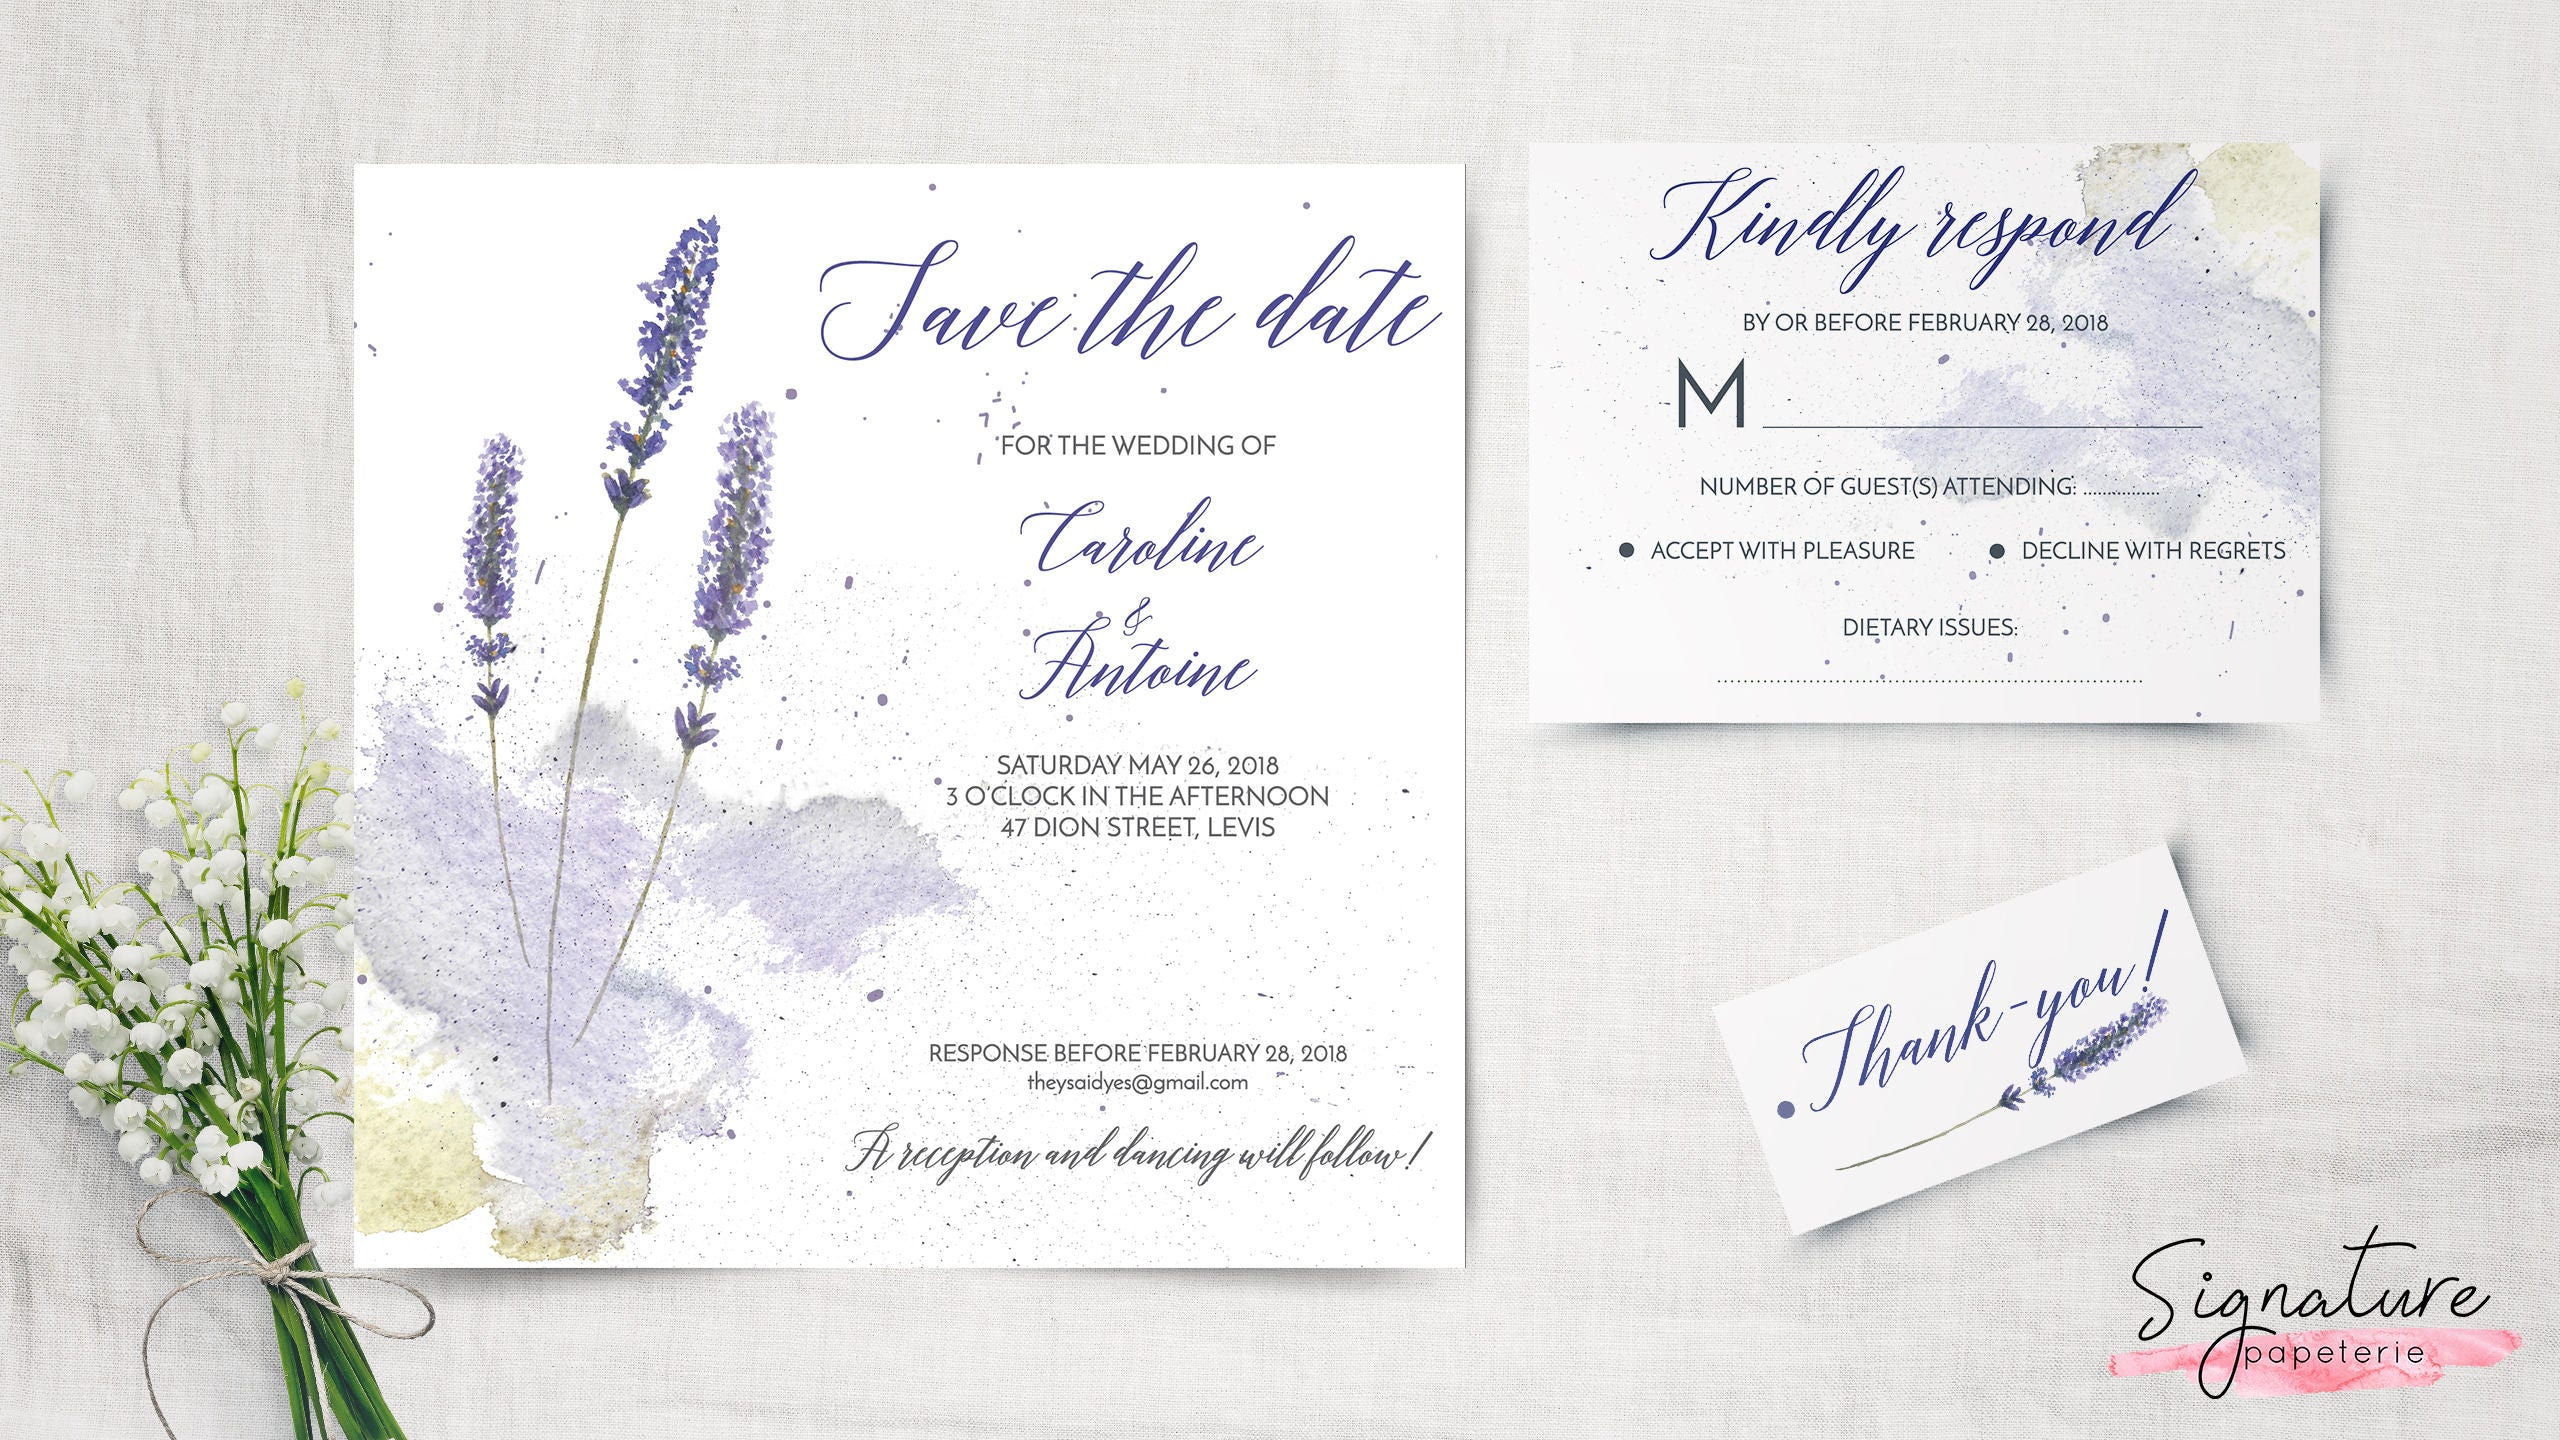 LAVANDULA Collection Lavender Wedding Invitation RSVP Card